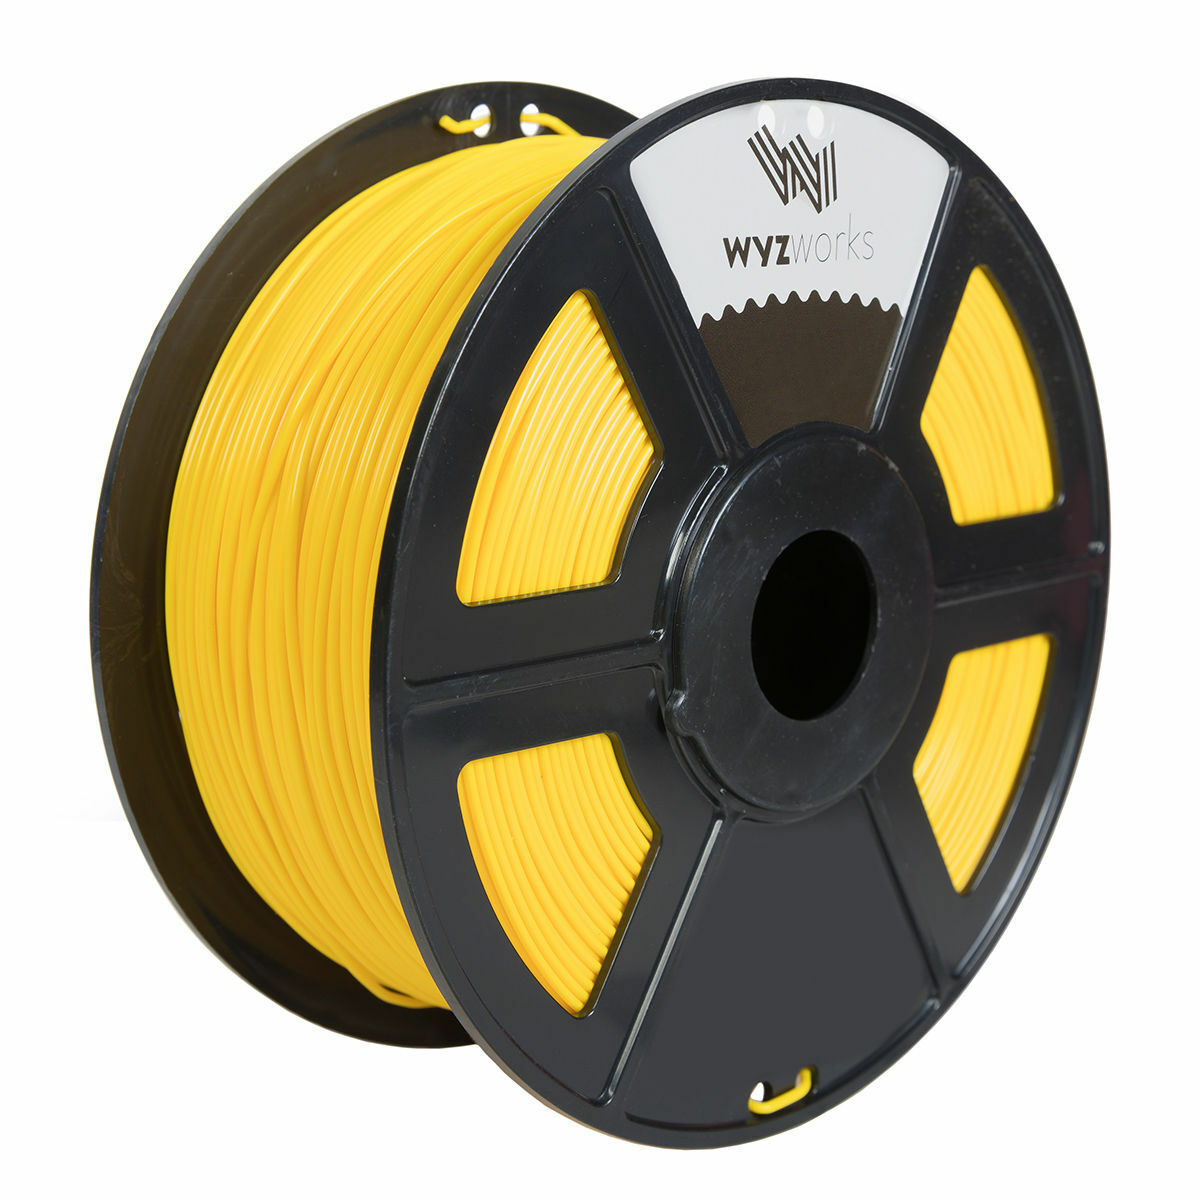 WYZworks 3D Printer Premium PETG Filament 1.75mm 1kg//2.2lb YELLOW